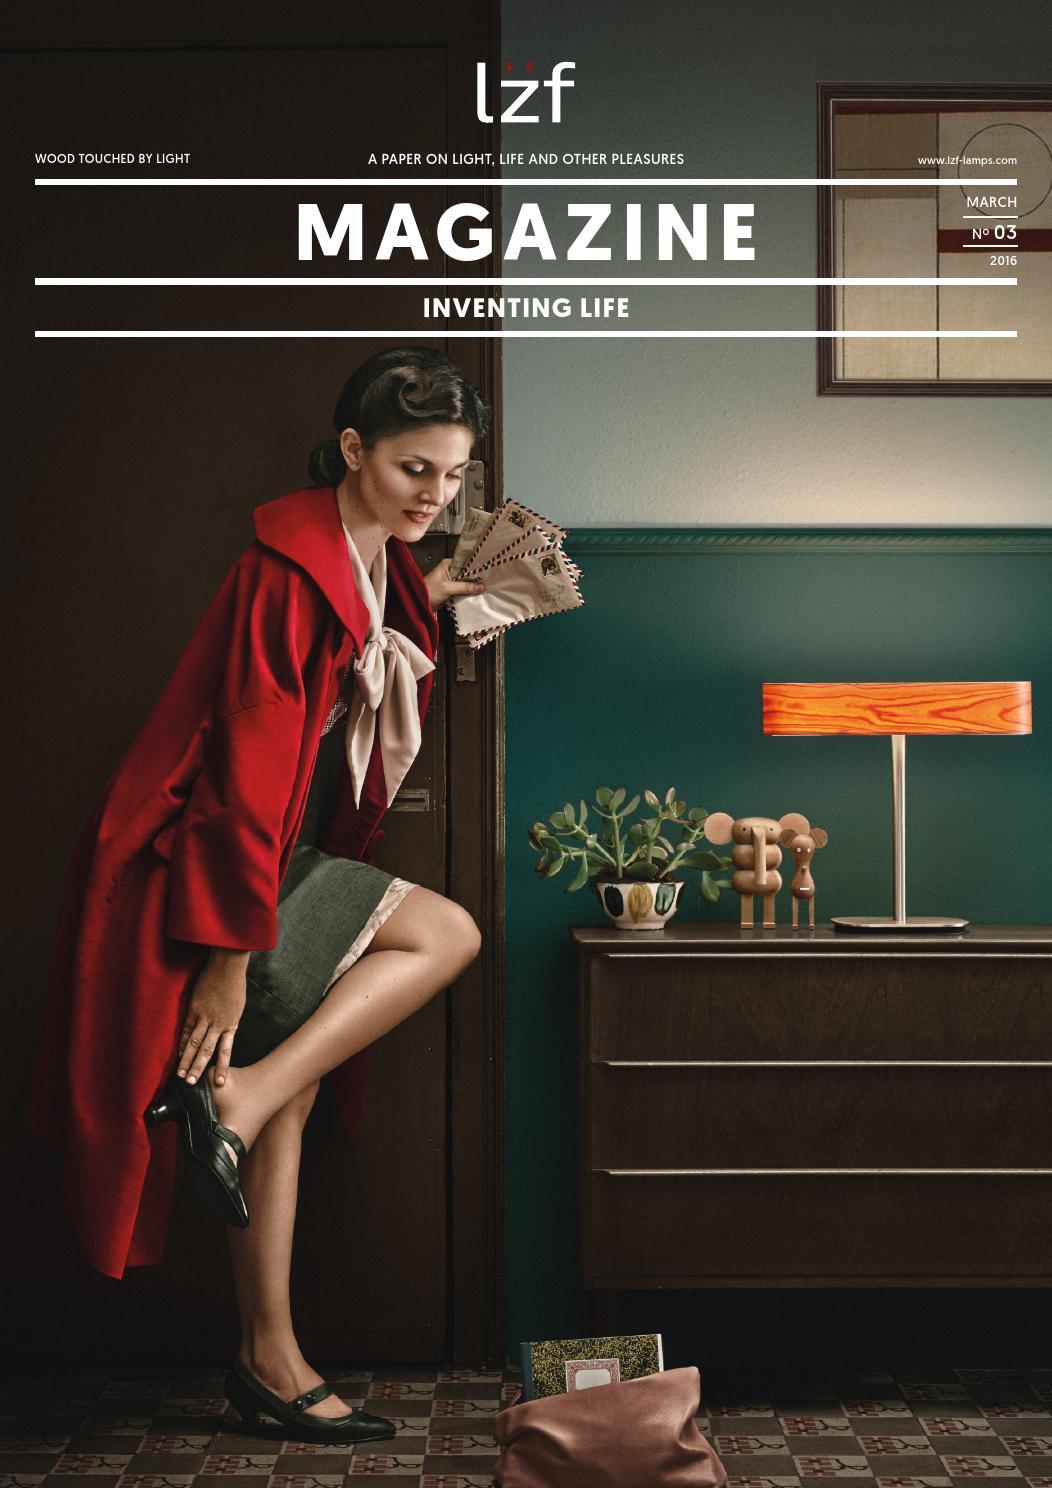 Lzf Magazine #3 by -LZF- - issuu